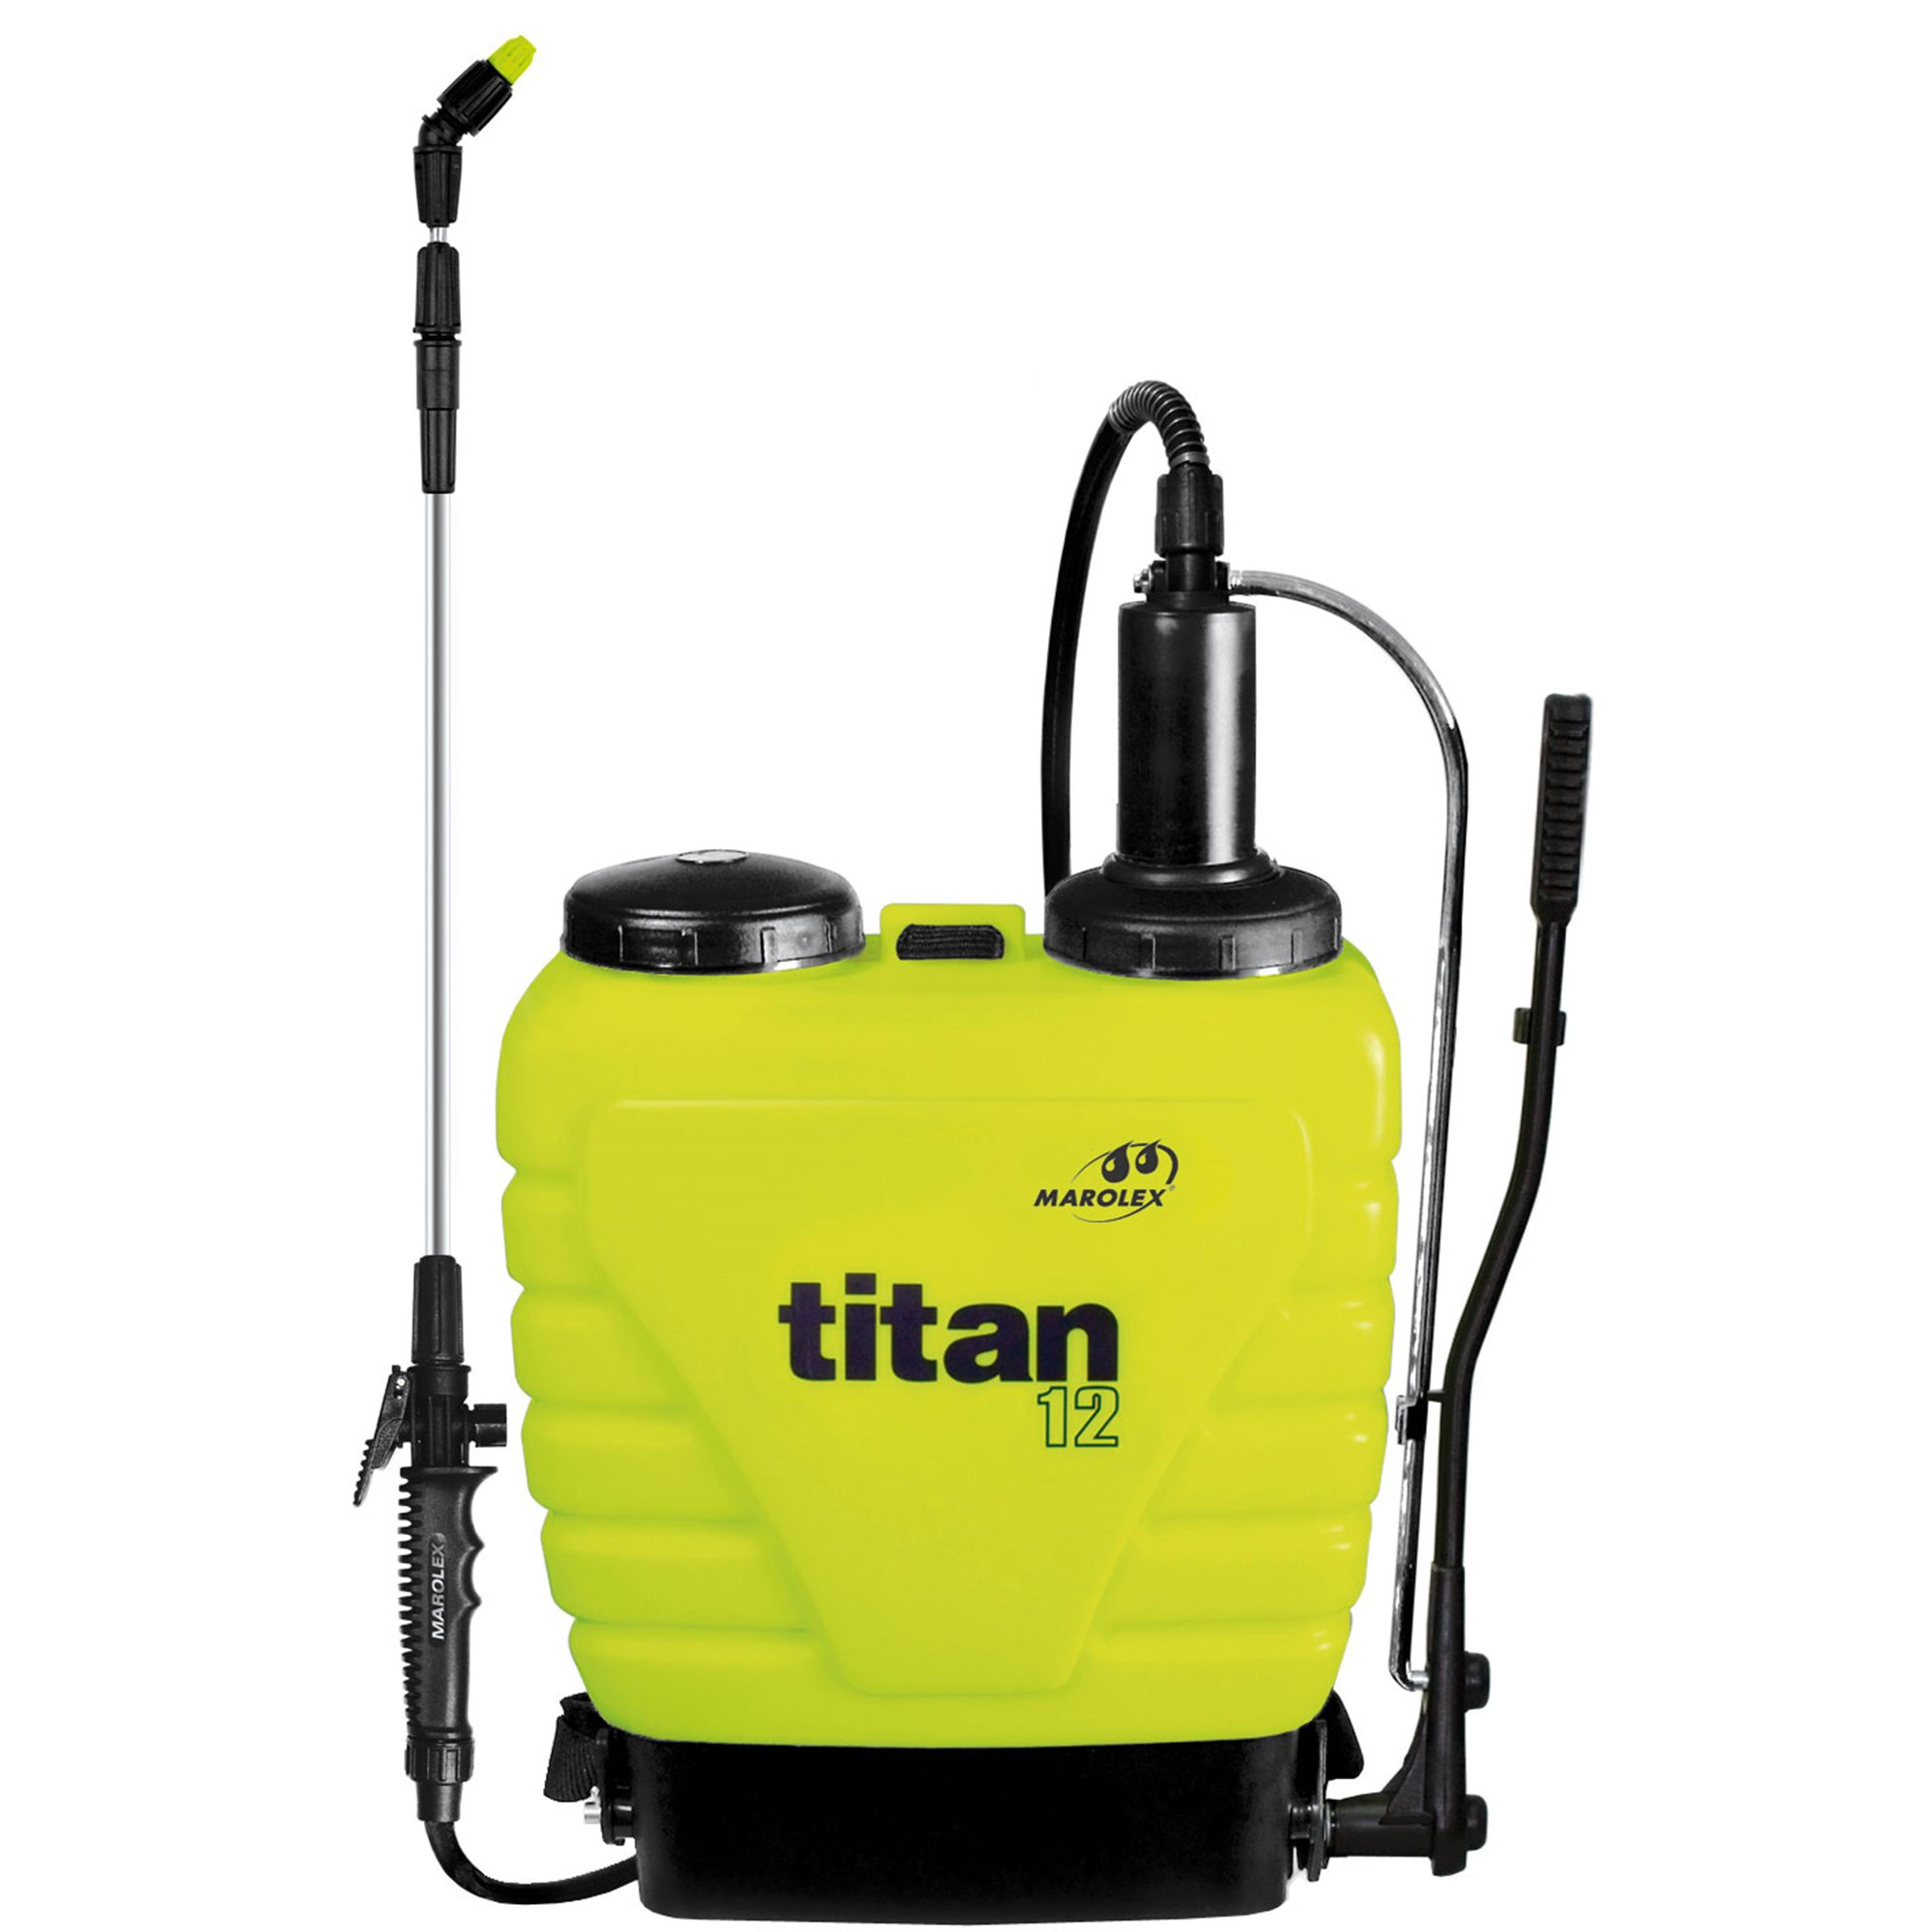 Marolex Sprayer Titan, Dichtung Viton Sprayer Titan 12 L. Viton